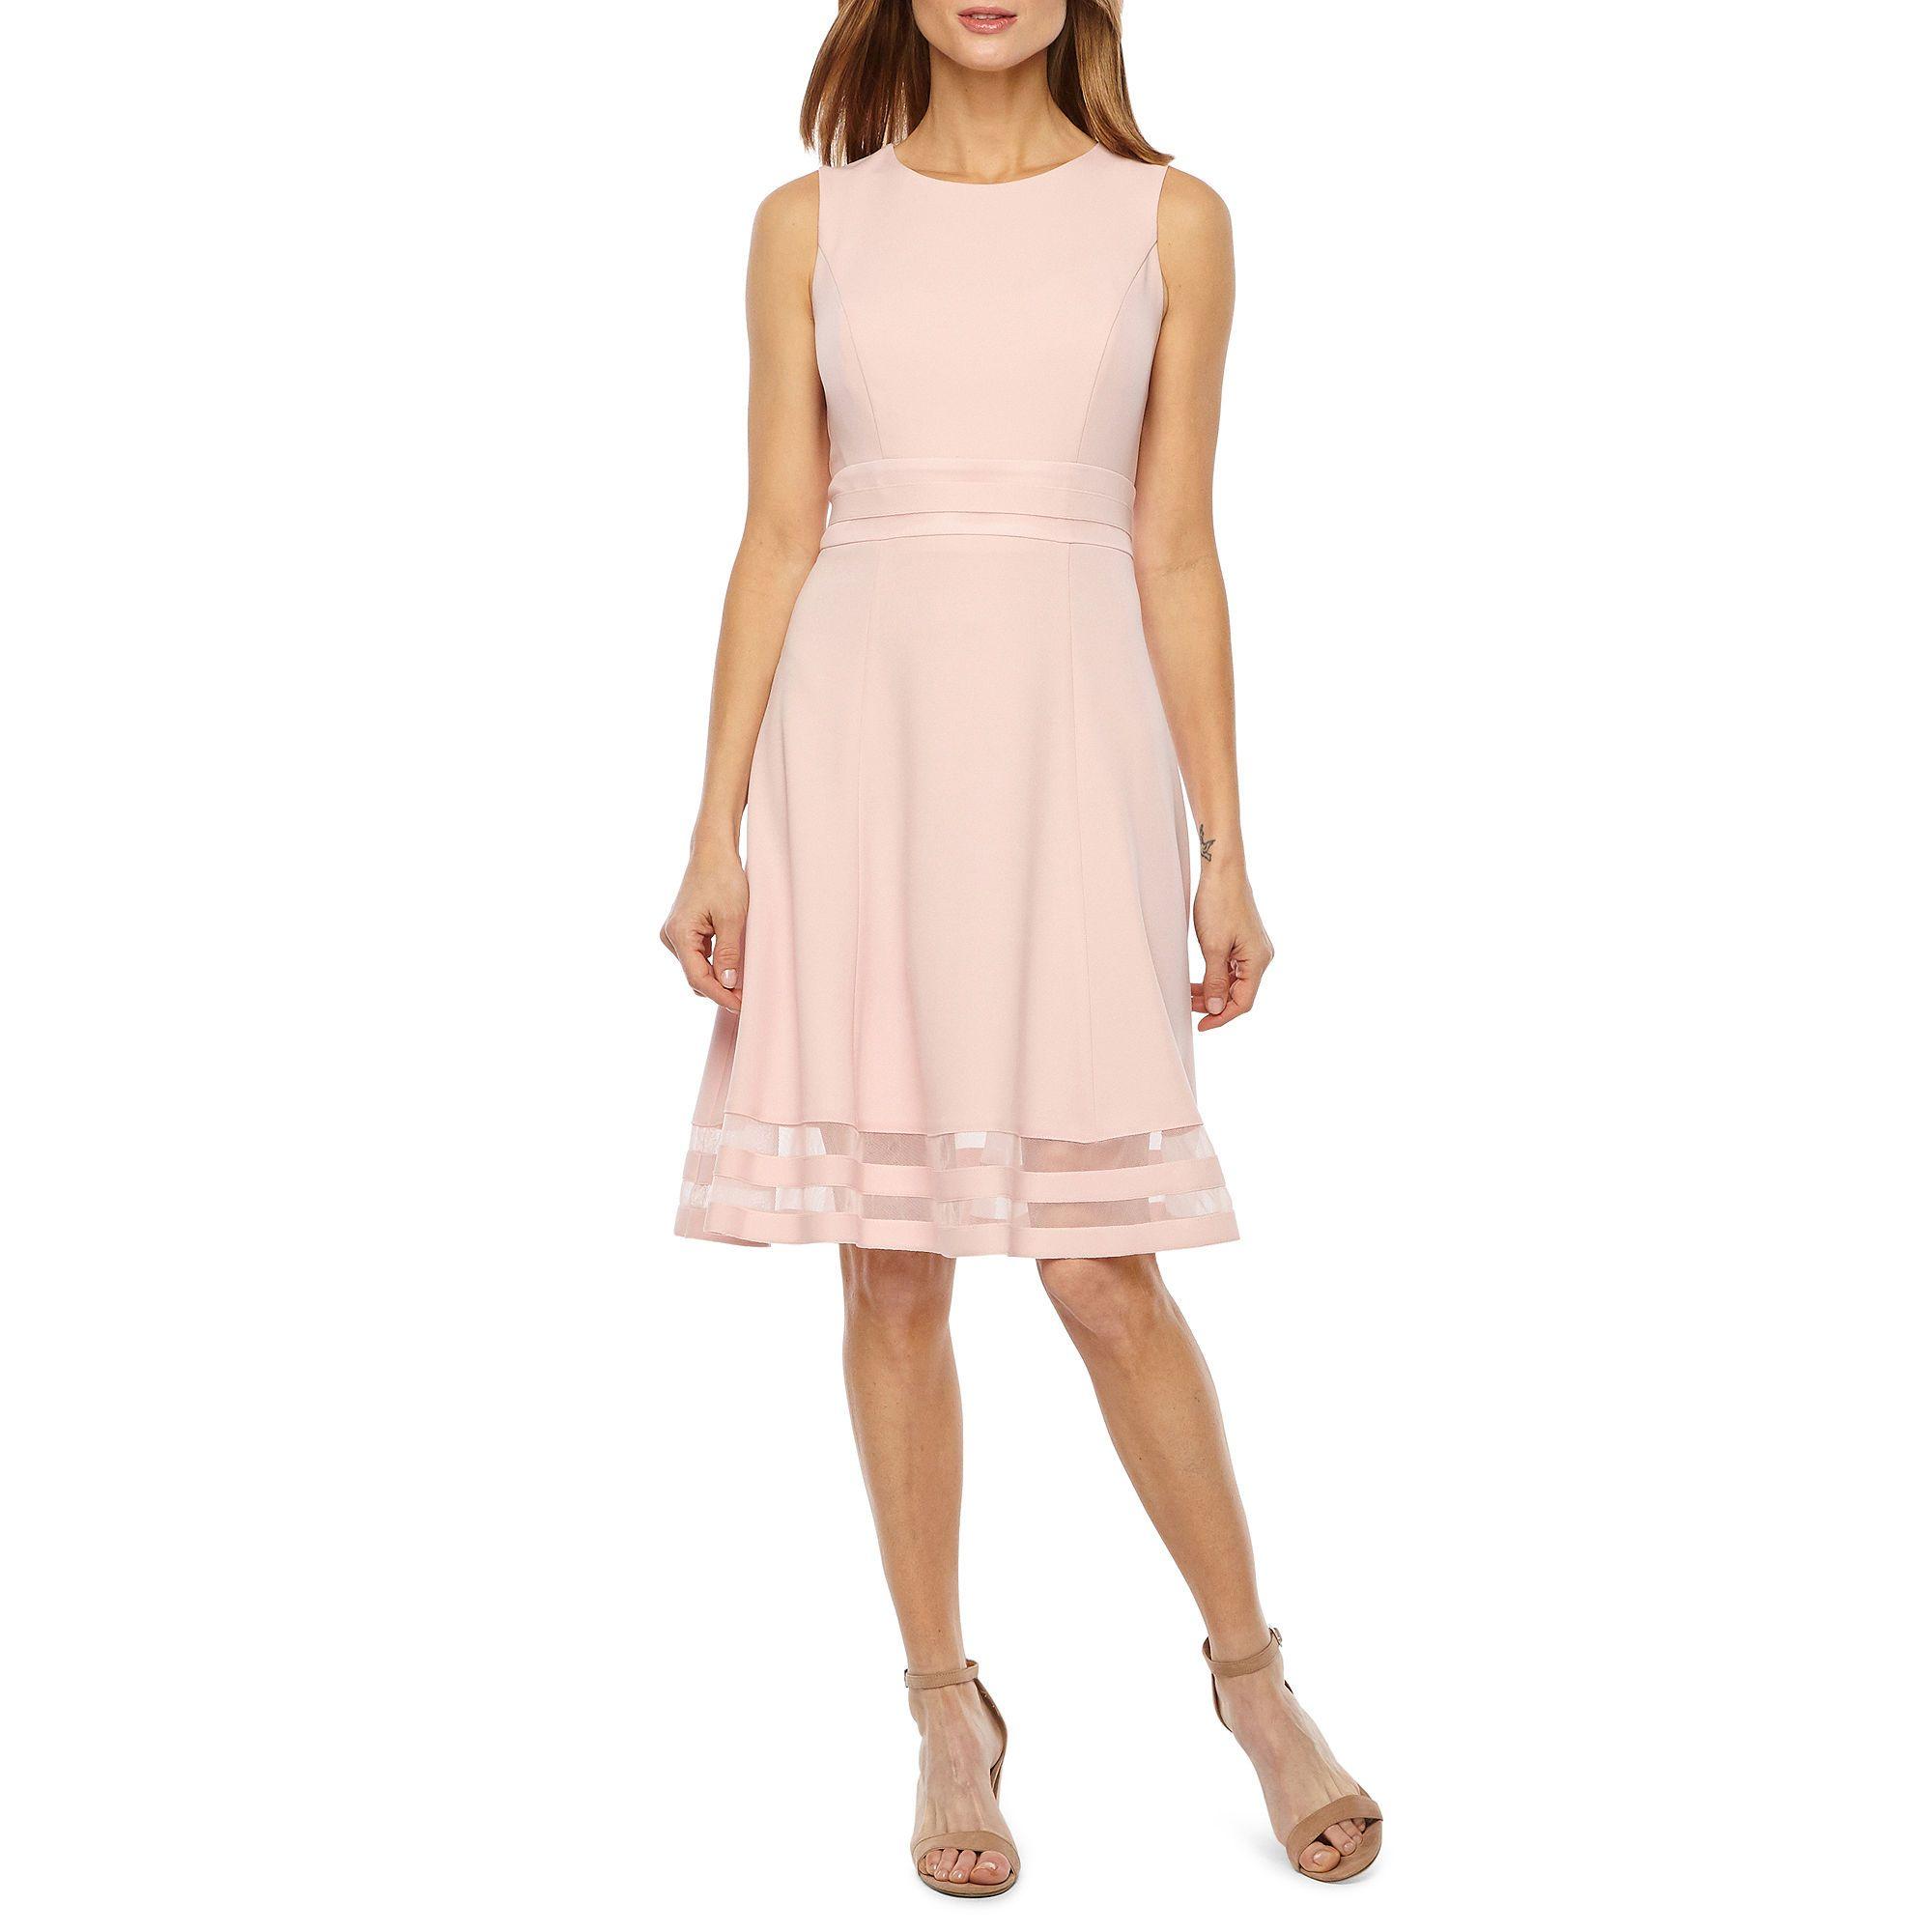 Liz Claiborne Sleeveless Fit Flare Dress Jcpenney Fit Flare Dress Flare Dress Dresses [ 2000 x 2000 Pixel ]